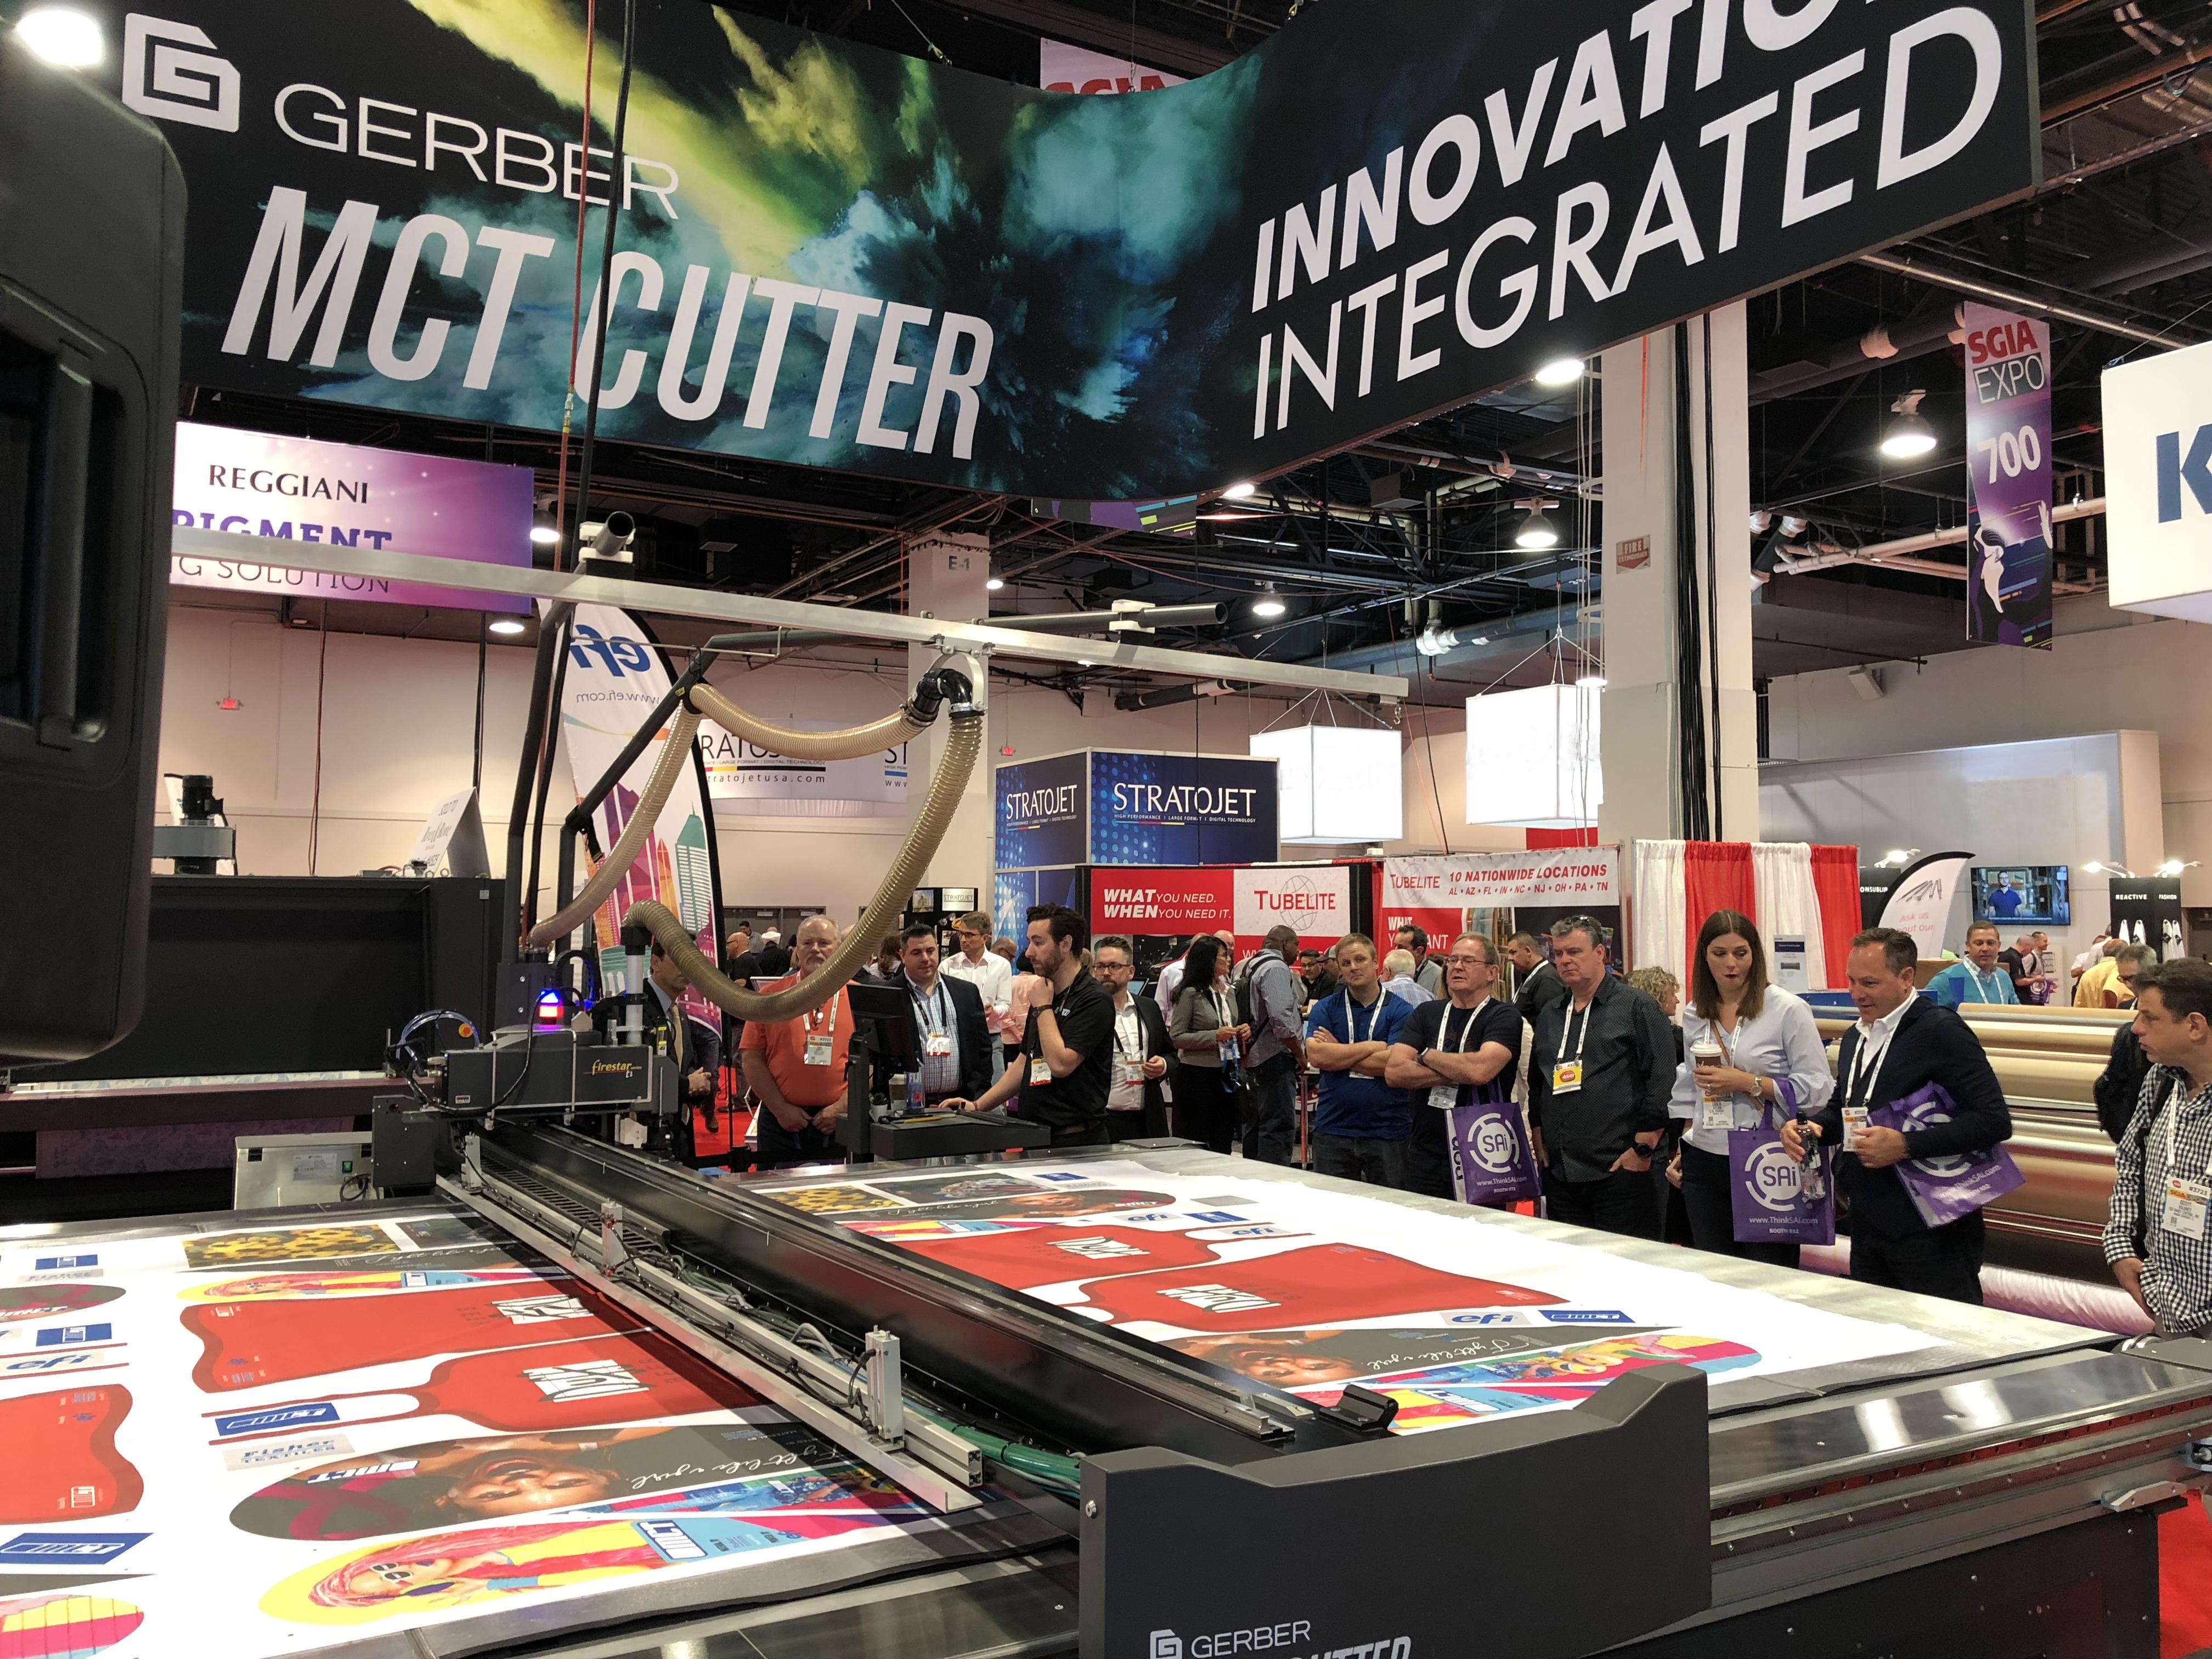 Gerber MCT Cutter SGIA 2018